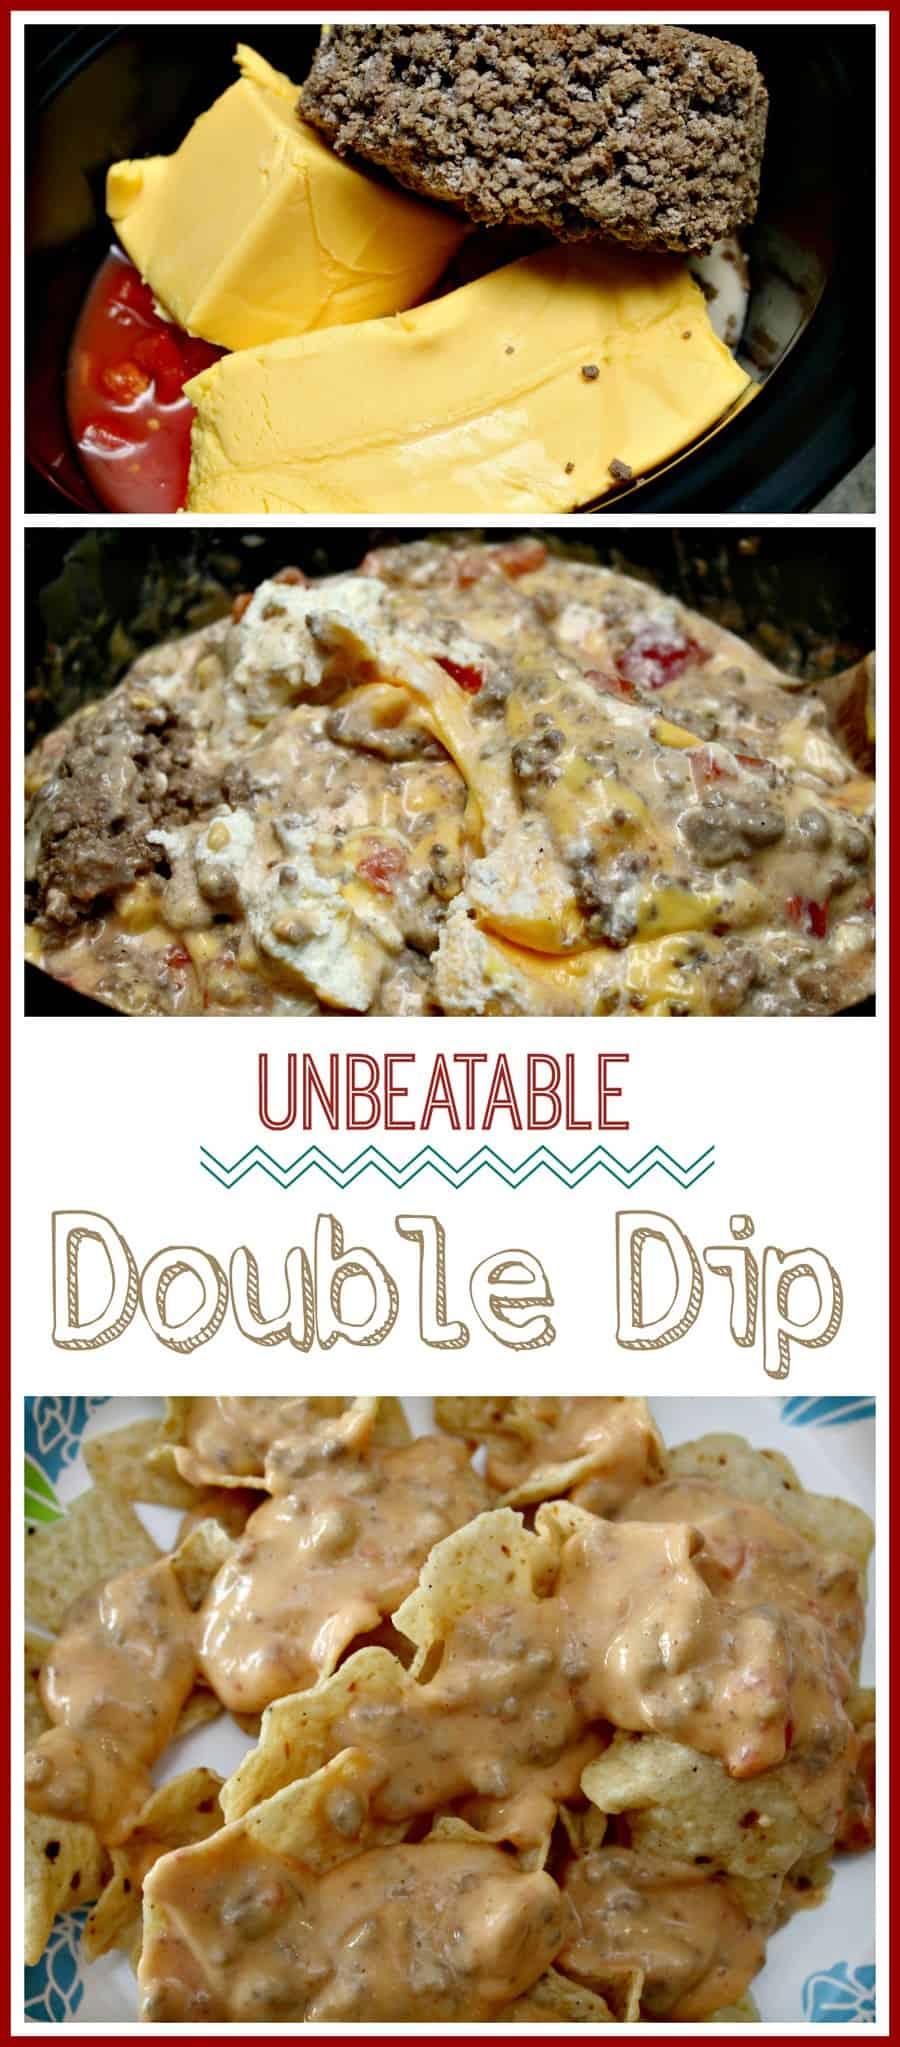 Unbeatable Double Dip { Big Game Party Dip Recipe!}